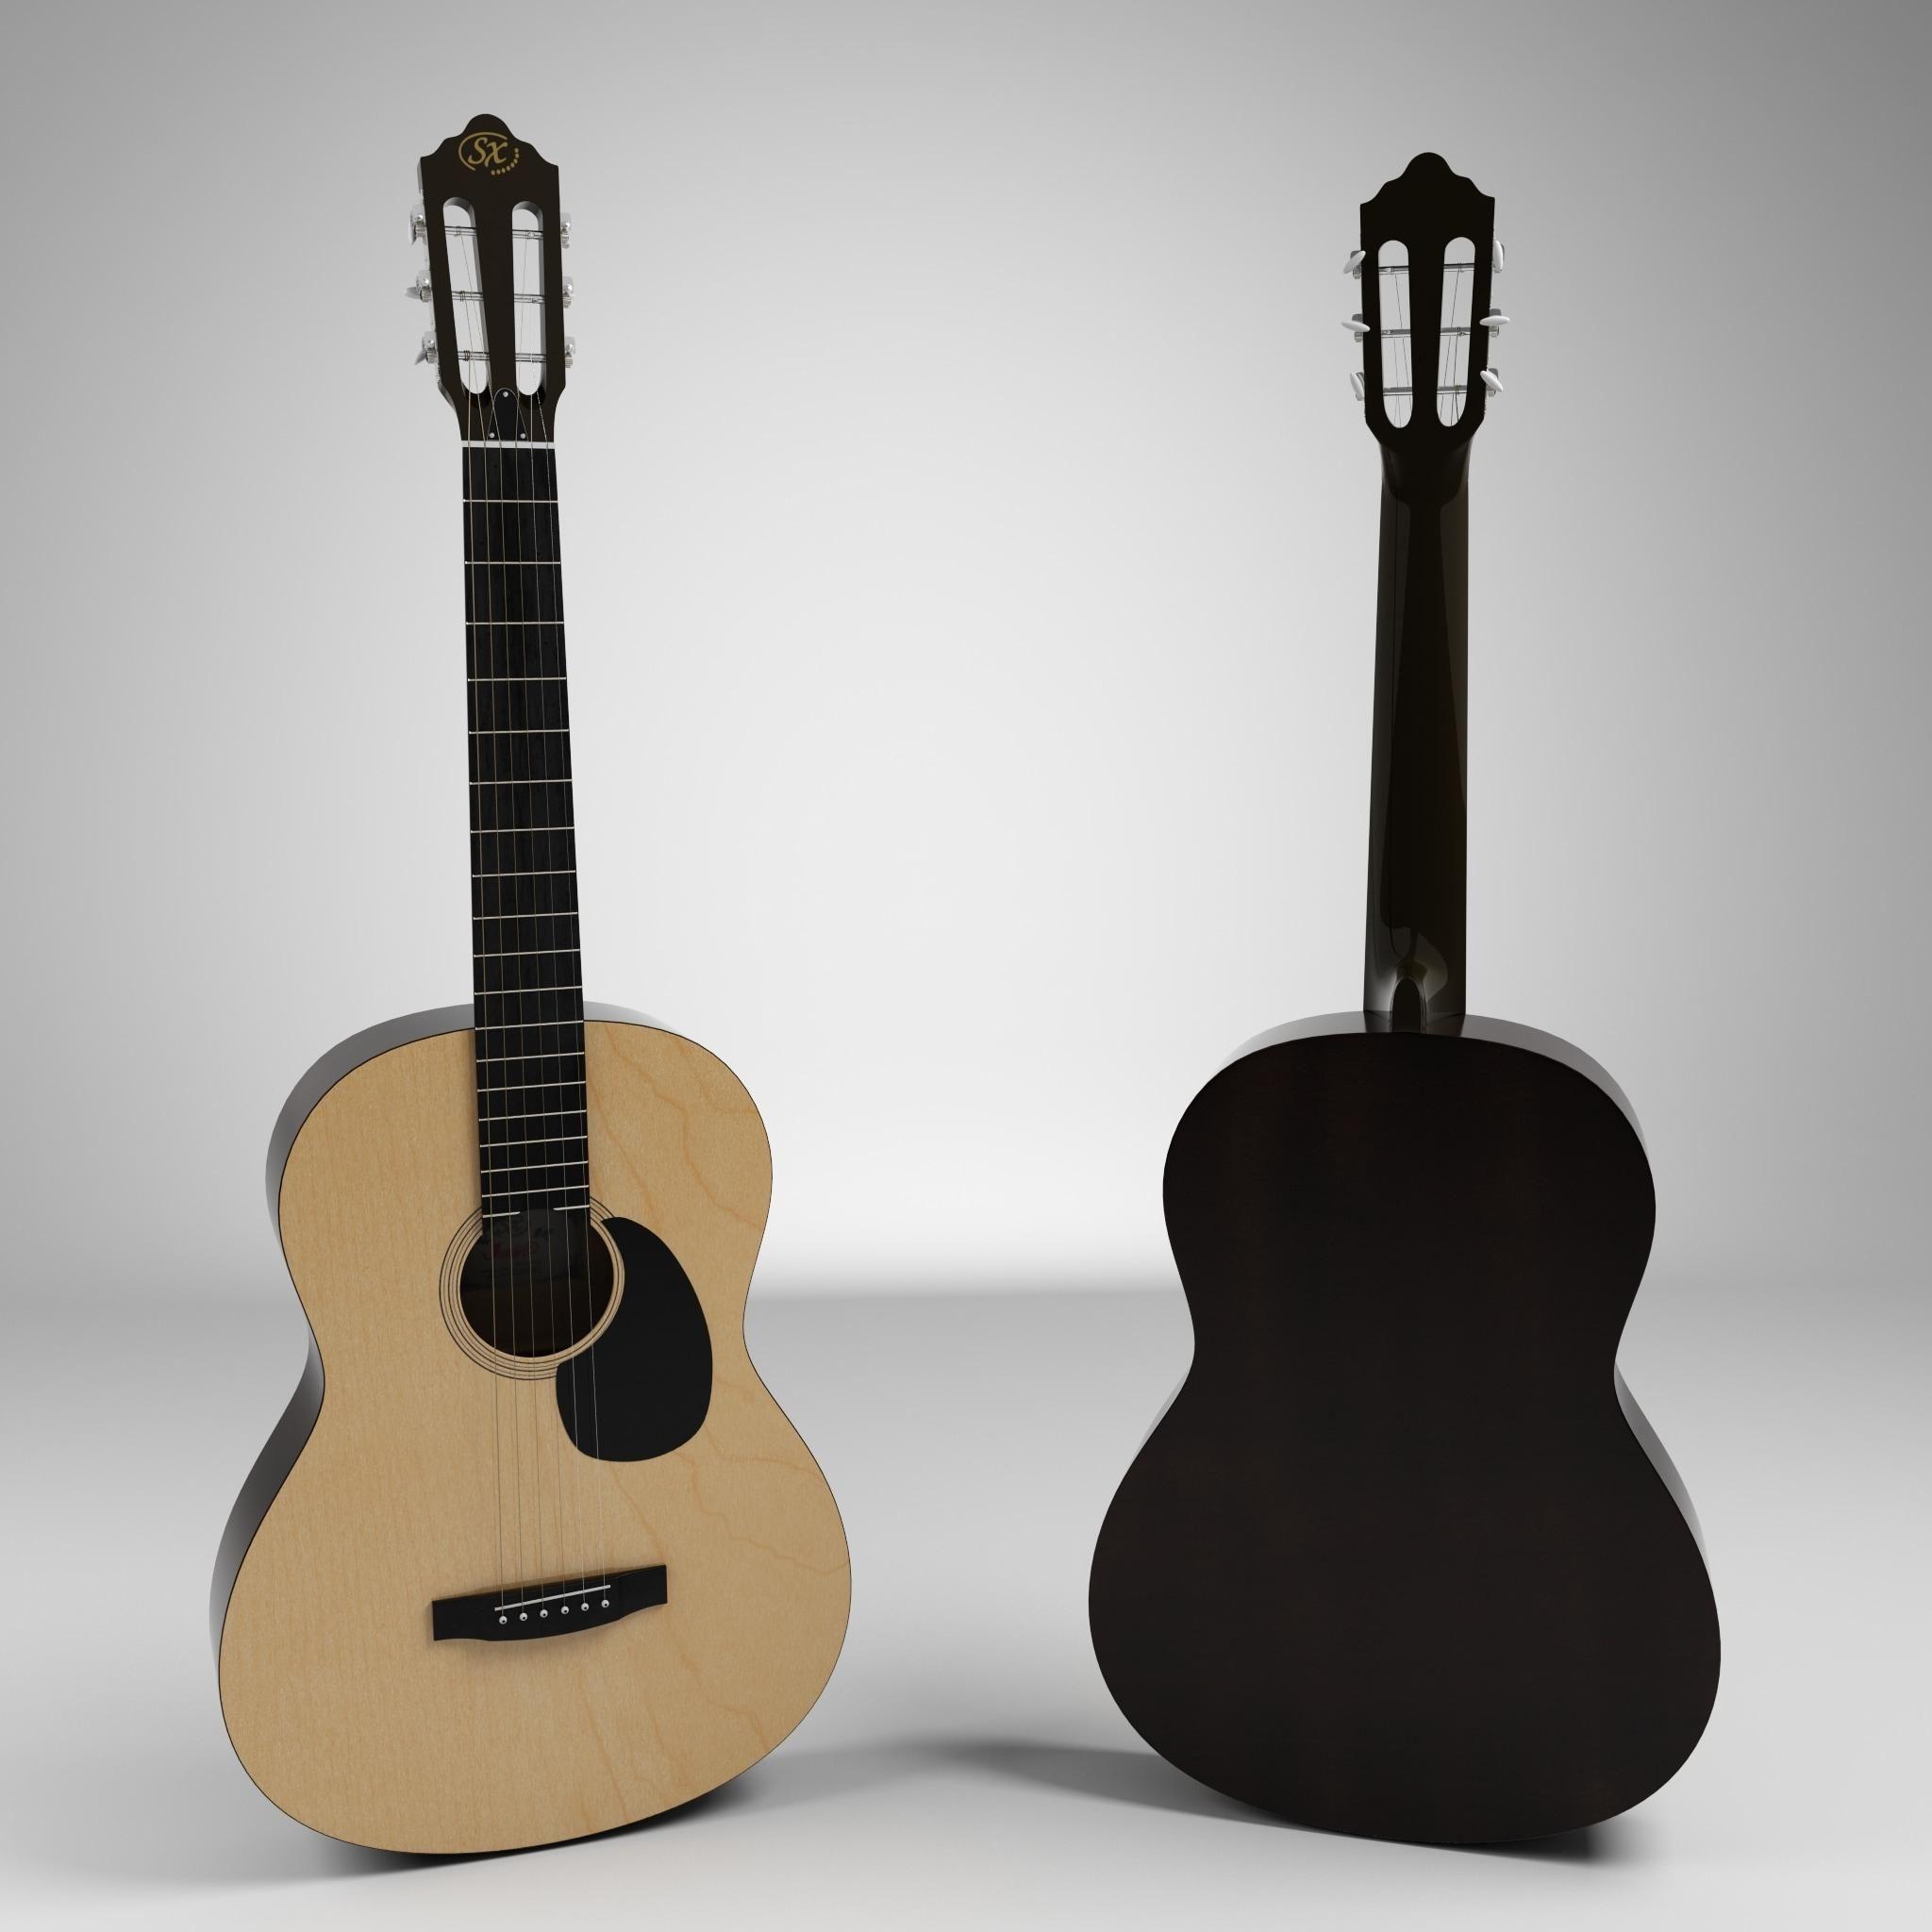 Acoustic Guitar 3d Model Ad Acoustic Guitar Model Guitar Acoustic Guitar Acoustic